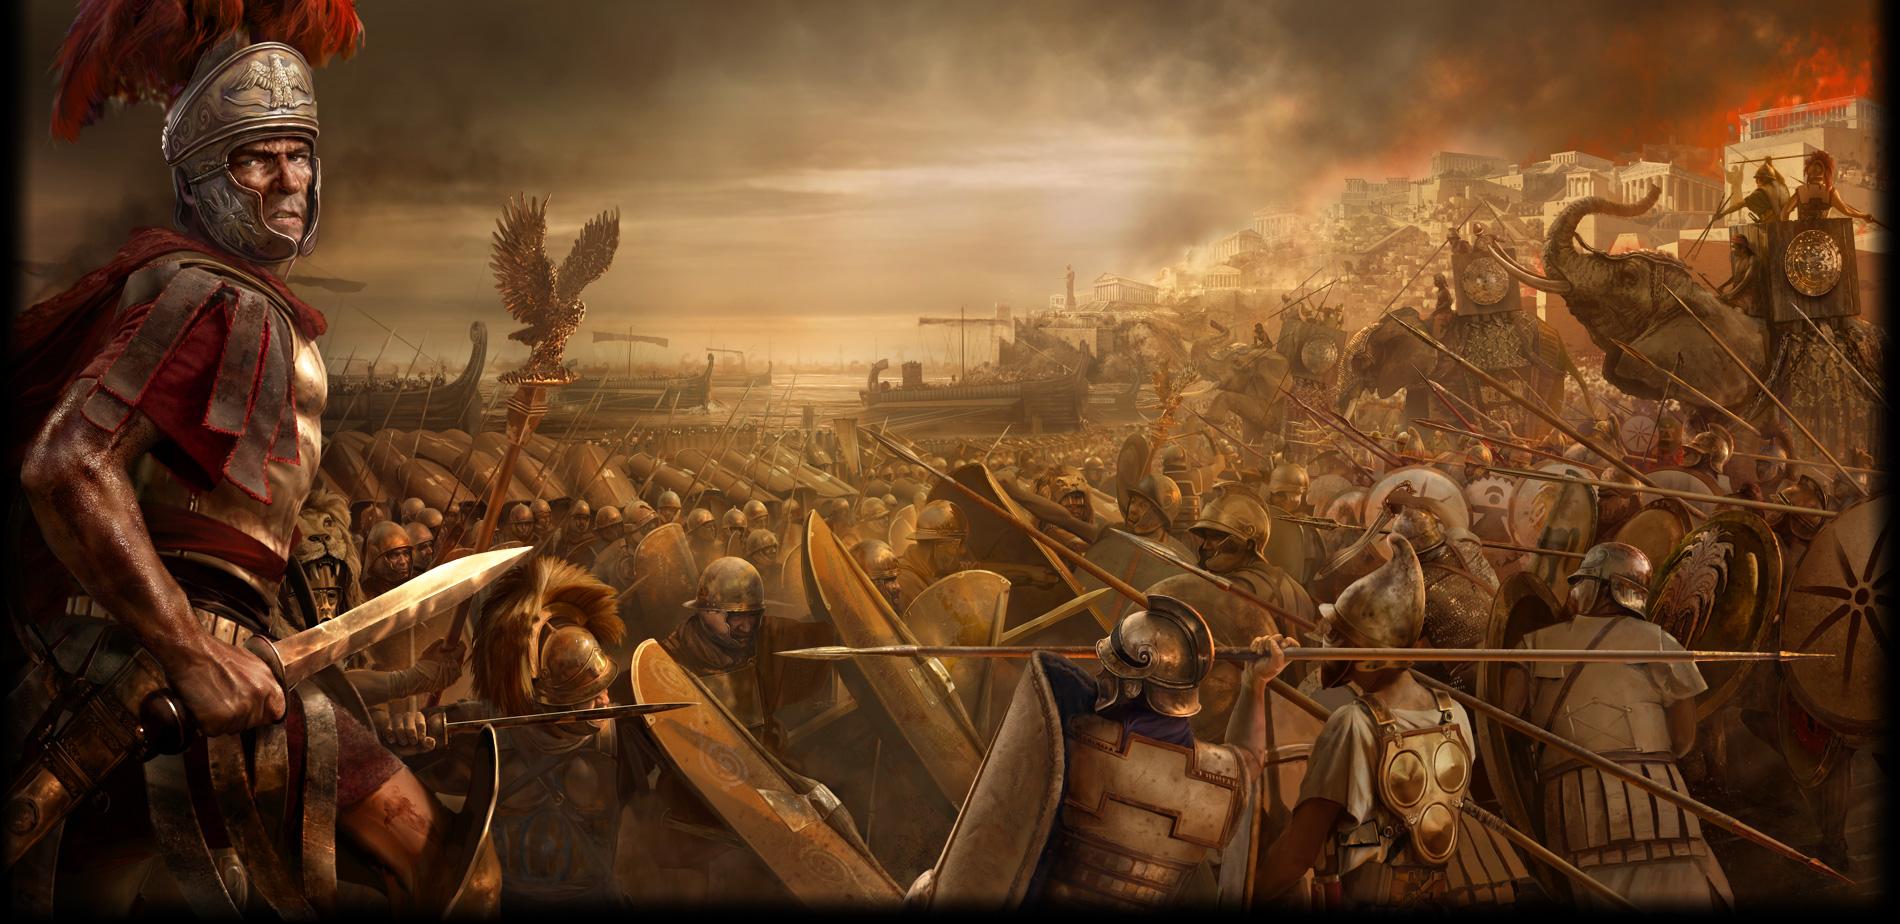 download Sega fantasy roman army warrior warriors battle 1900x924